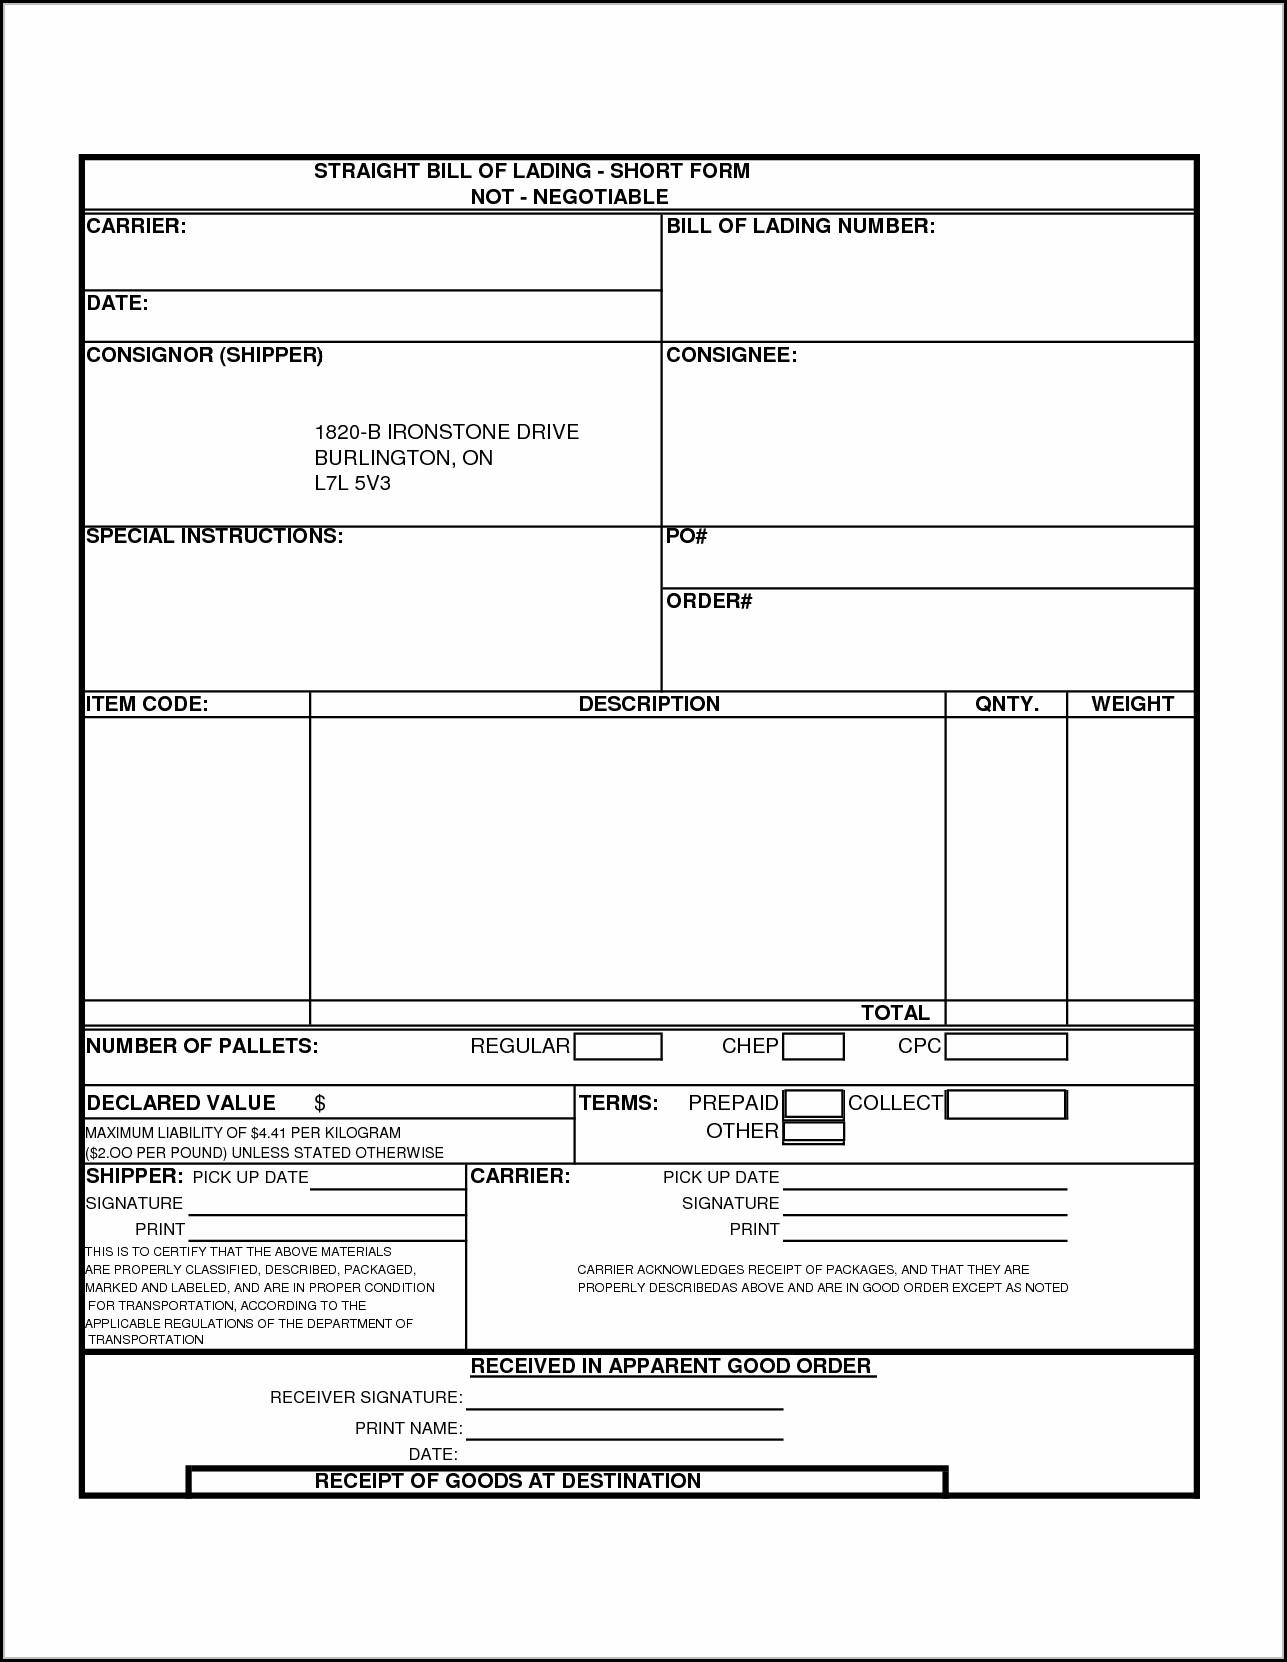 Free Printable Bill Of Lading Short Form